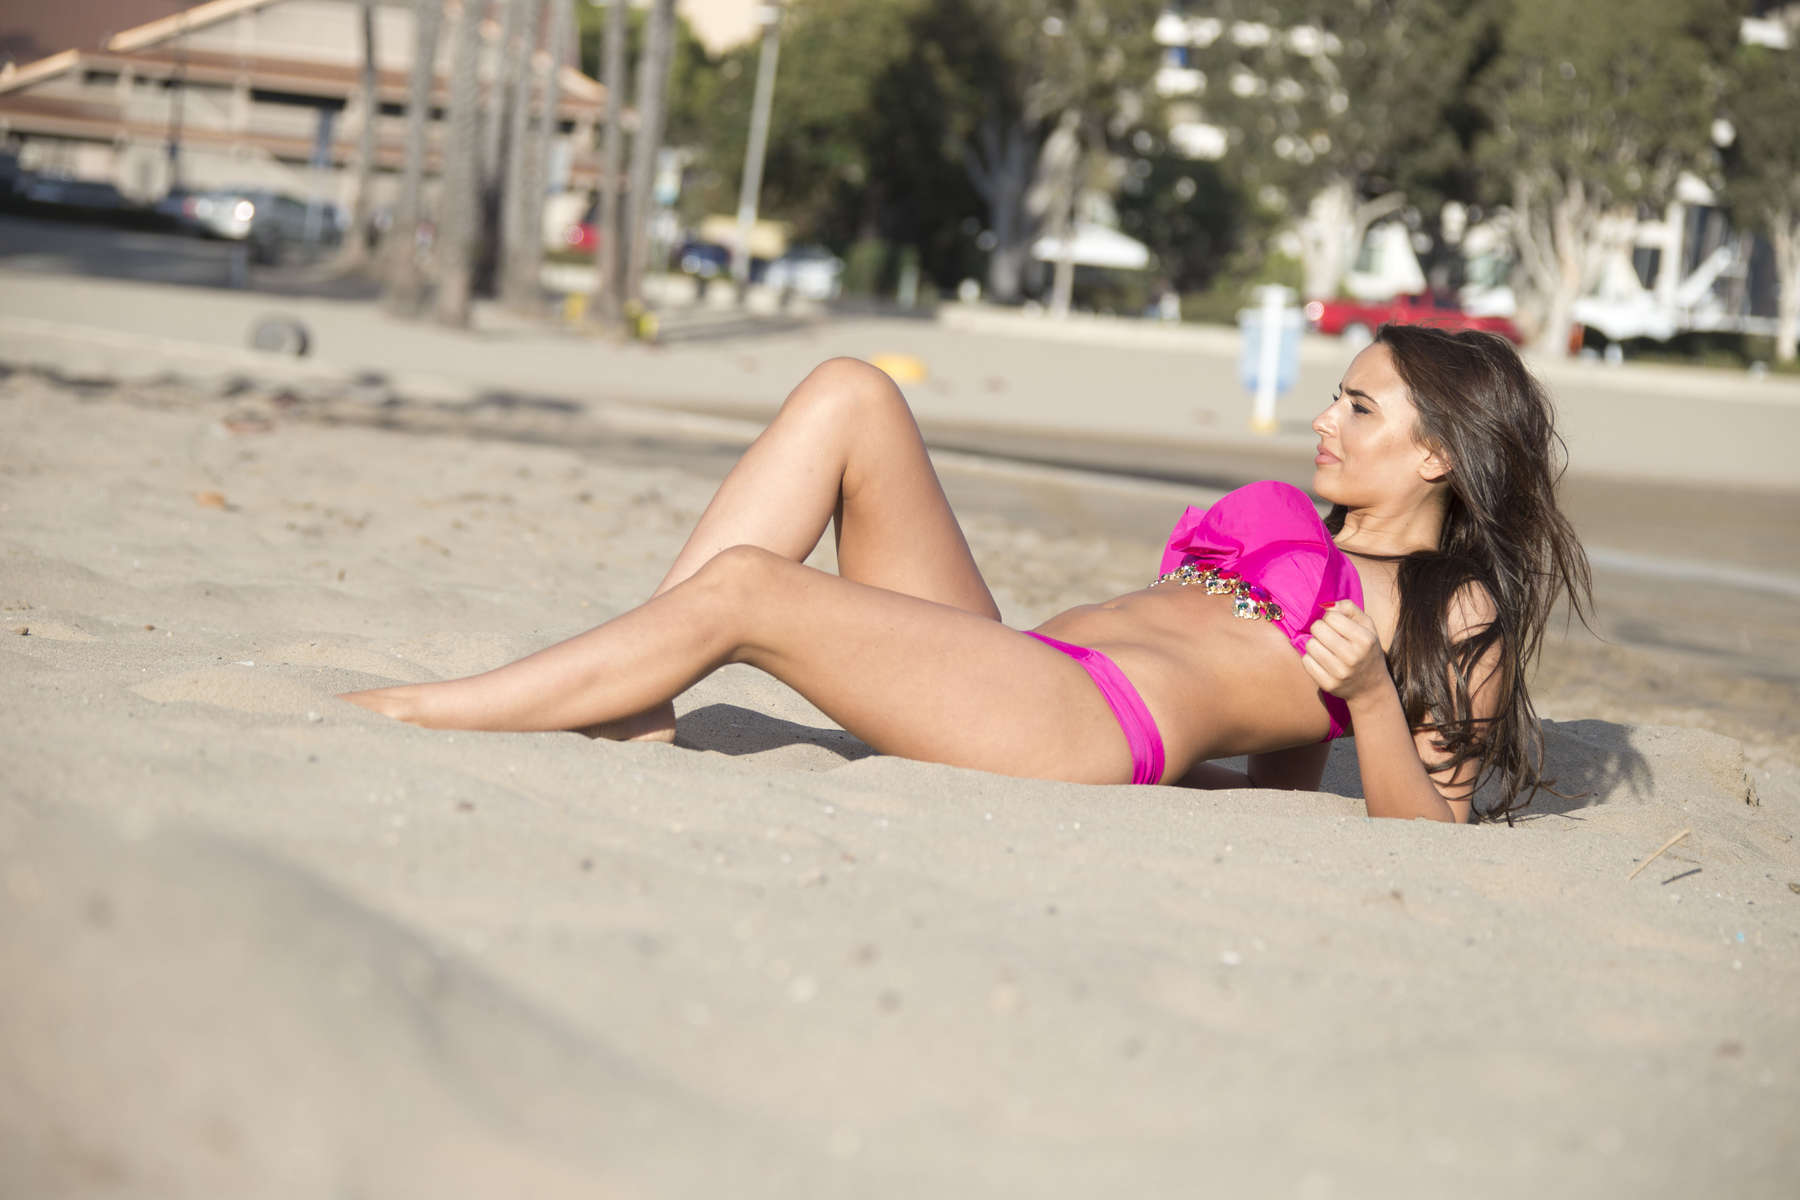 Nadia Forde 2016 : Nadia Forde in Pink Bikini -12